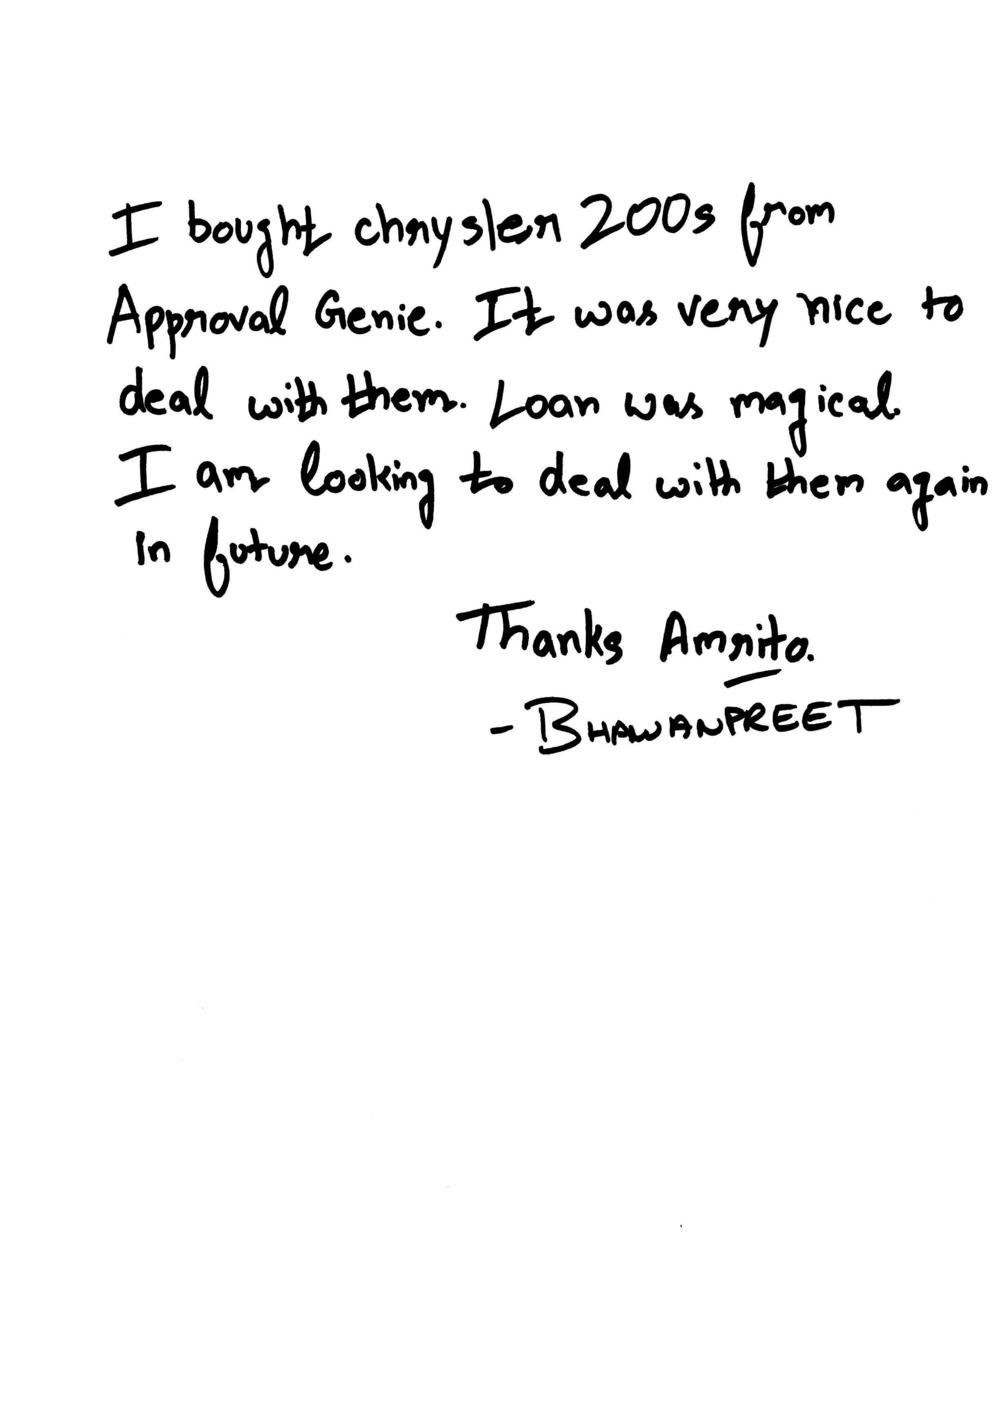 Bhawanpreet Singh_Testimonial & Picture_Page_1.jpg